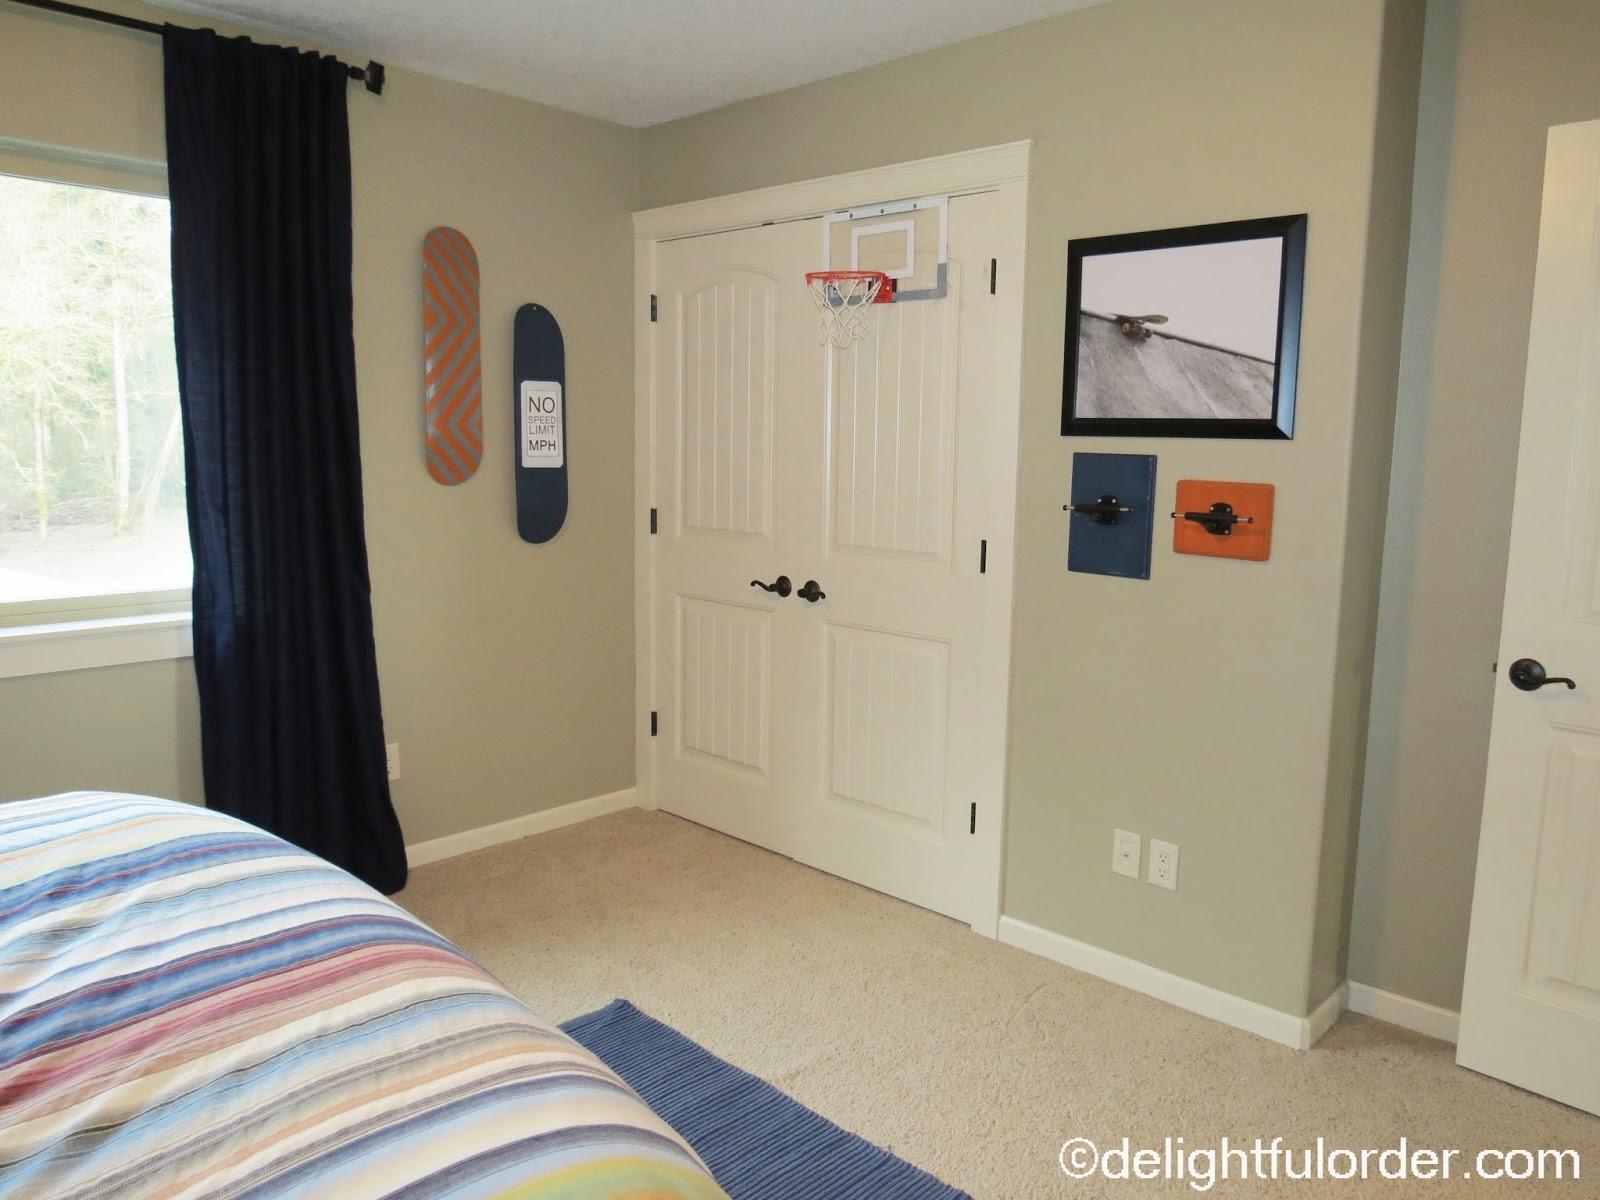 Skateboard Bedroom Furniture Delightful Order My Sons Skateboard Room